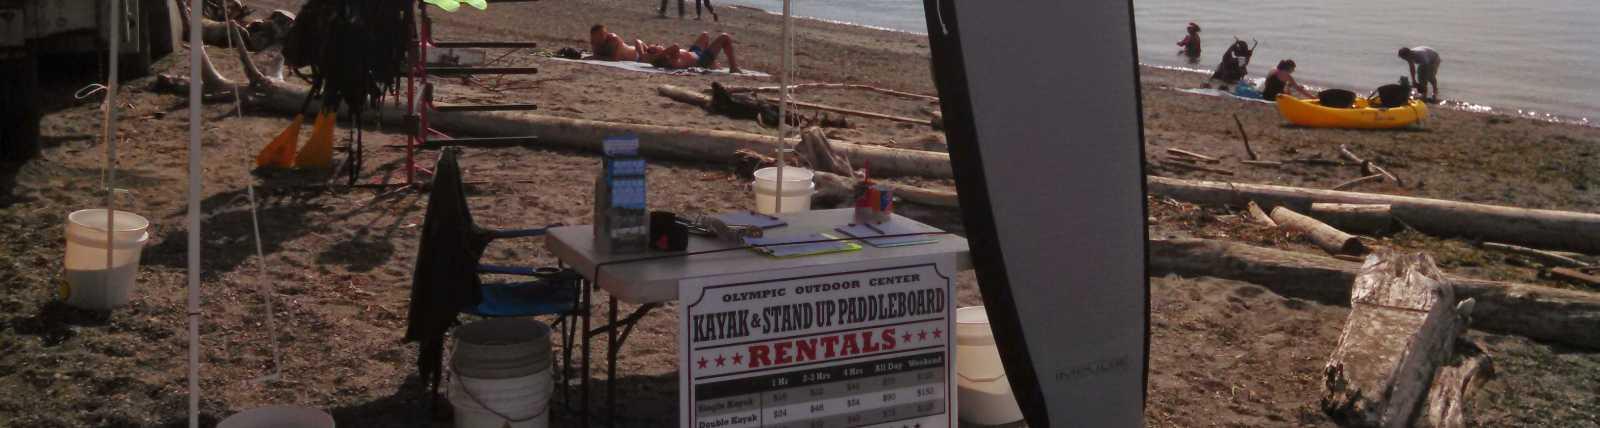 Olympic_Outdoor_Center_Redondo_Beach-3.jpg